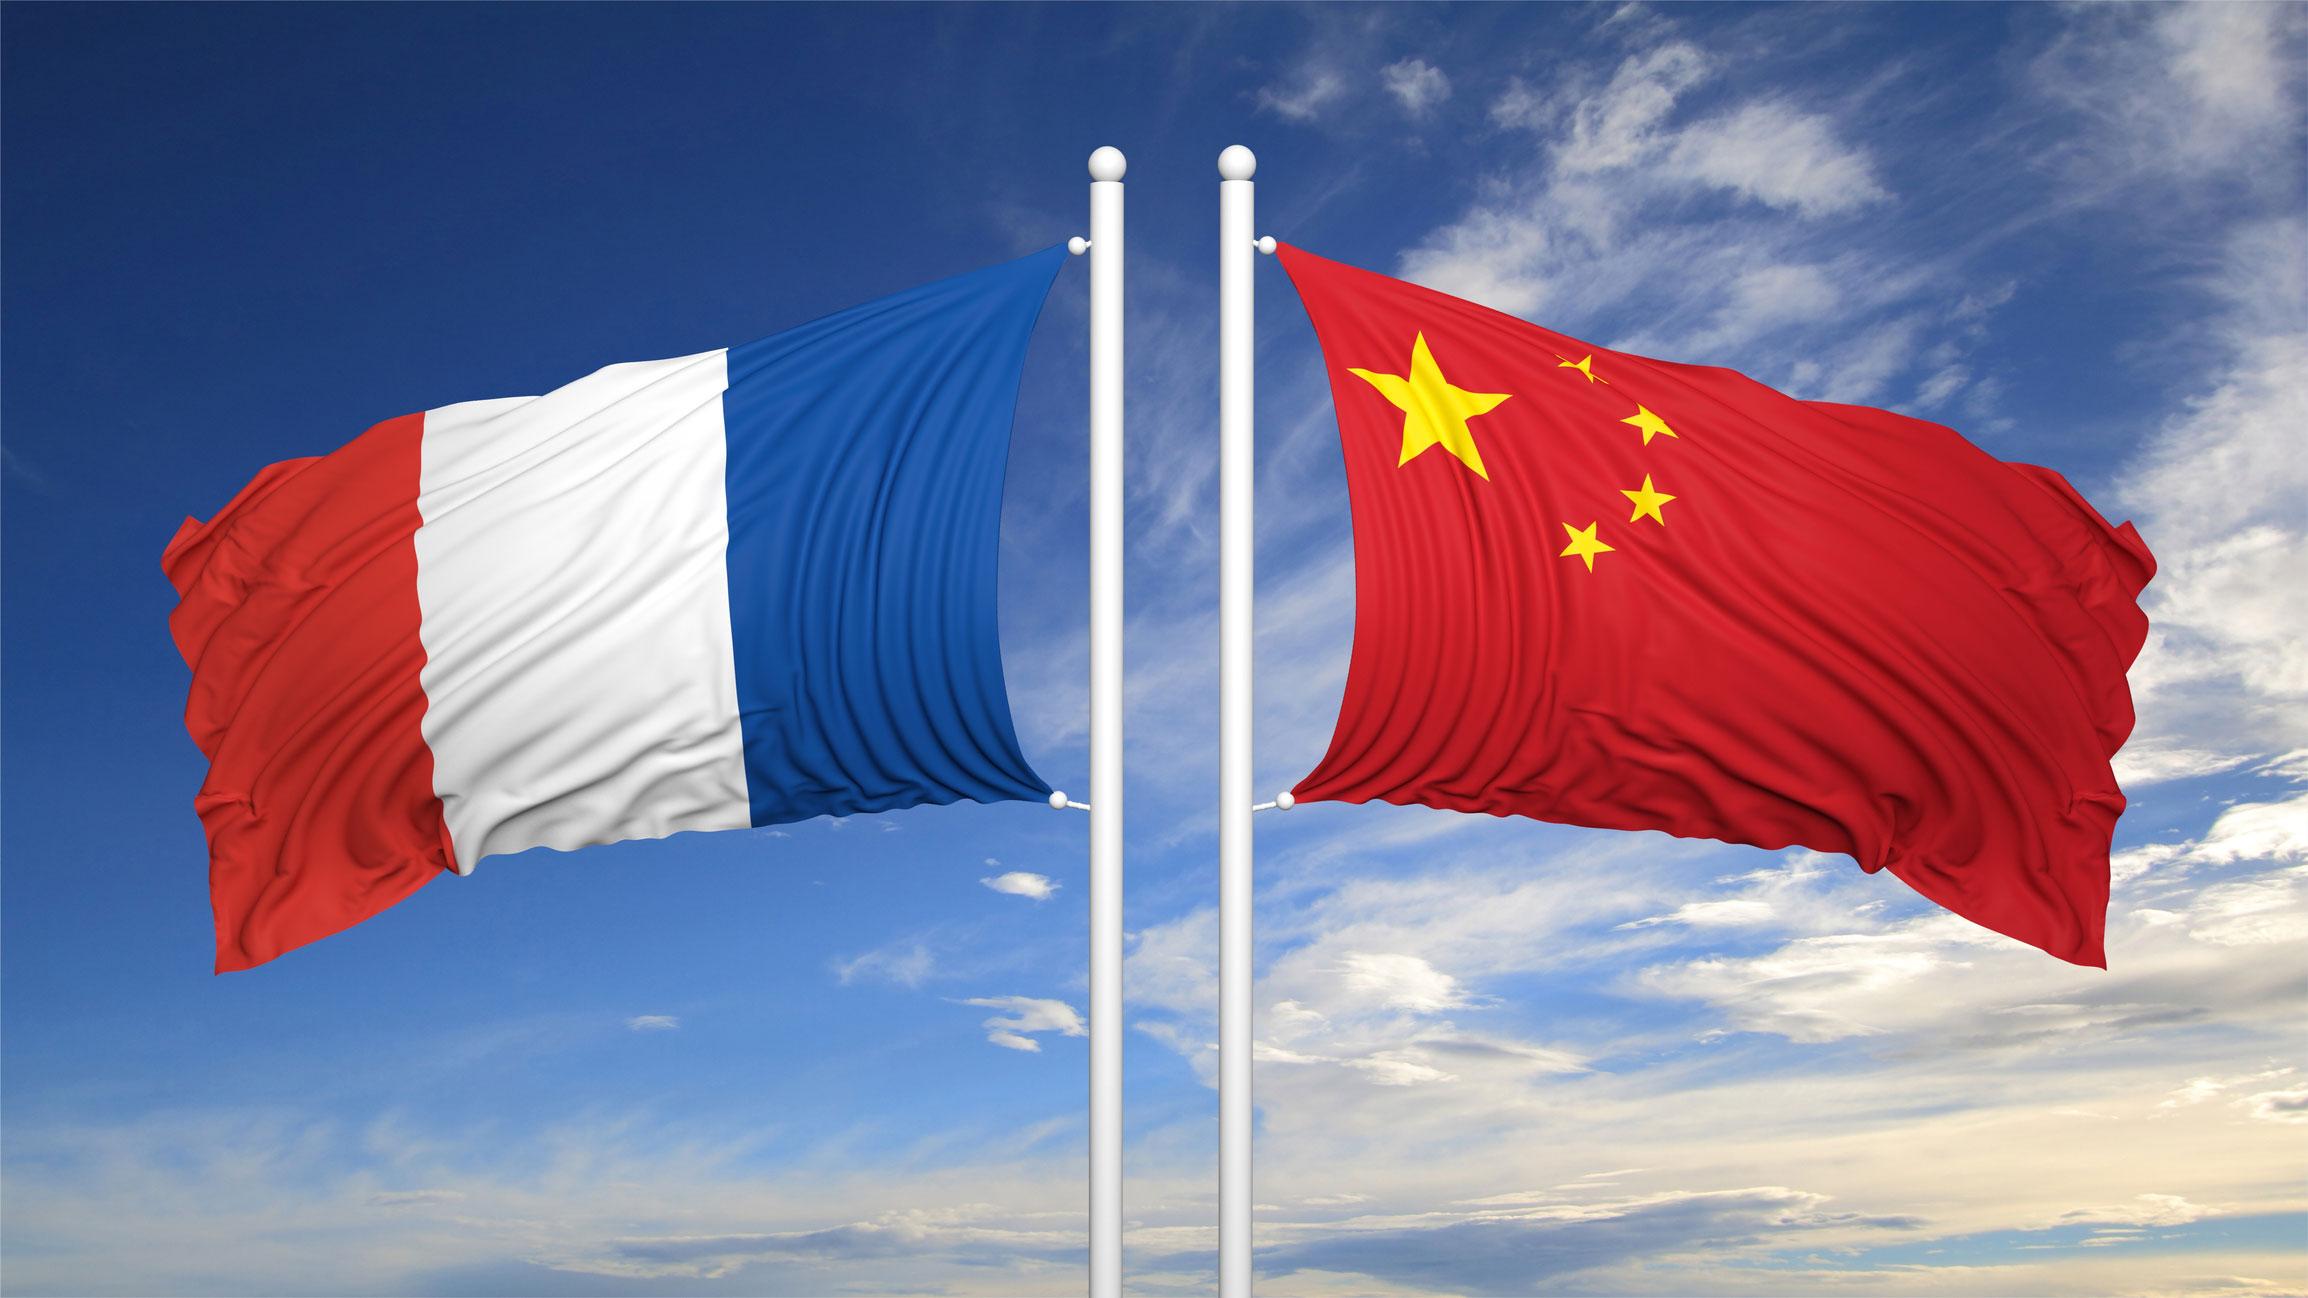 Visita del Presidente Chino a Francia e Italia - Atlas Overseas